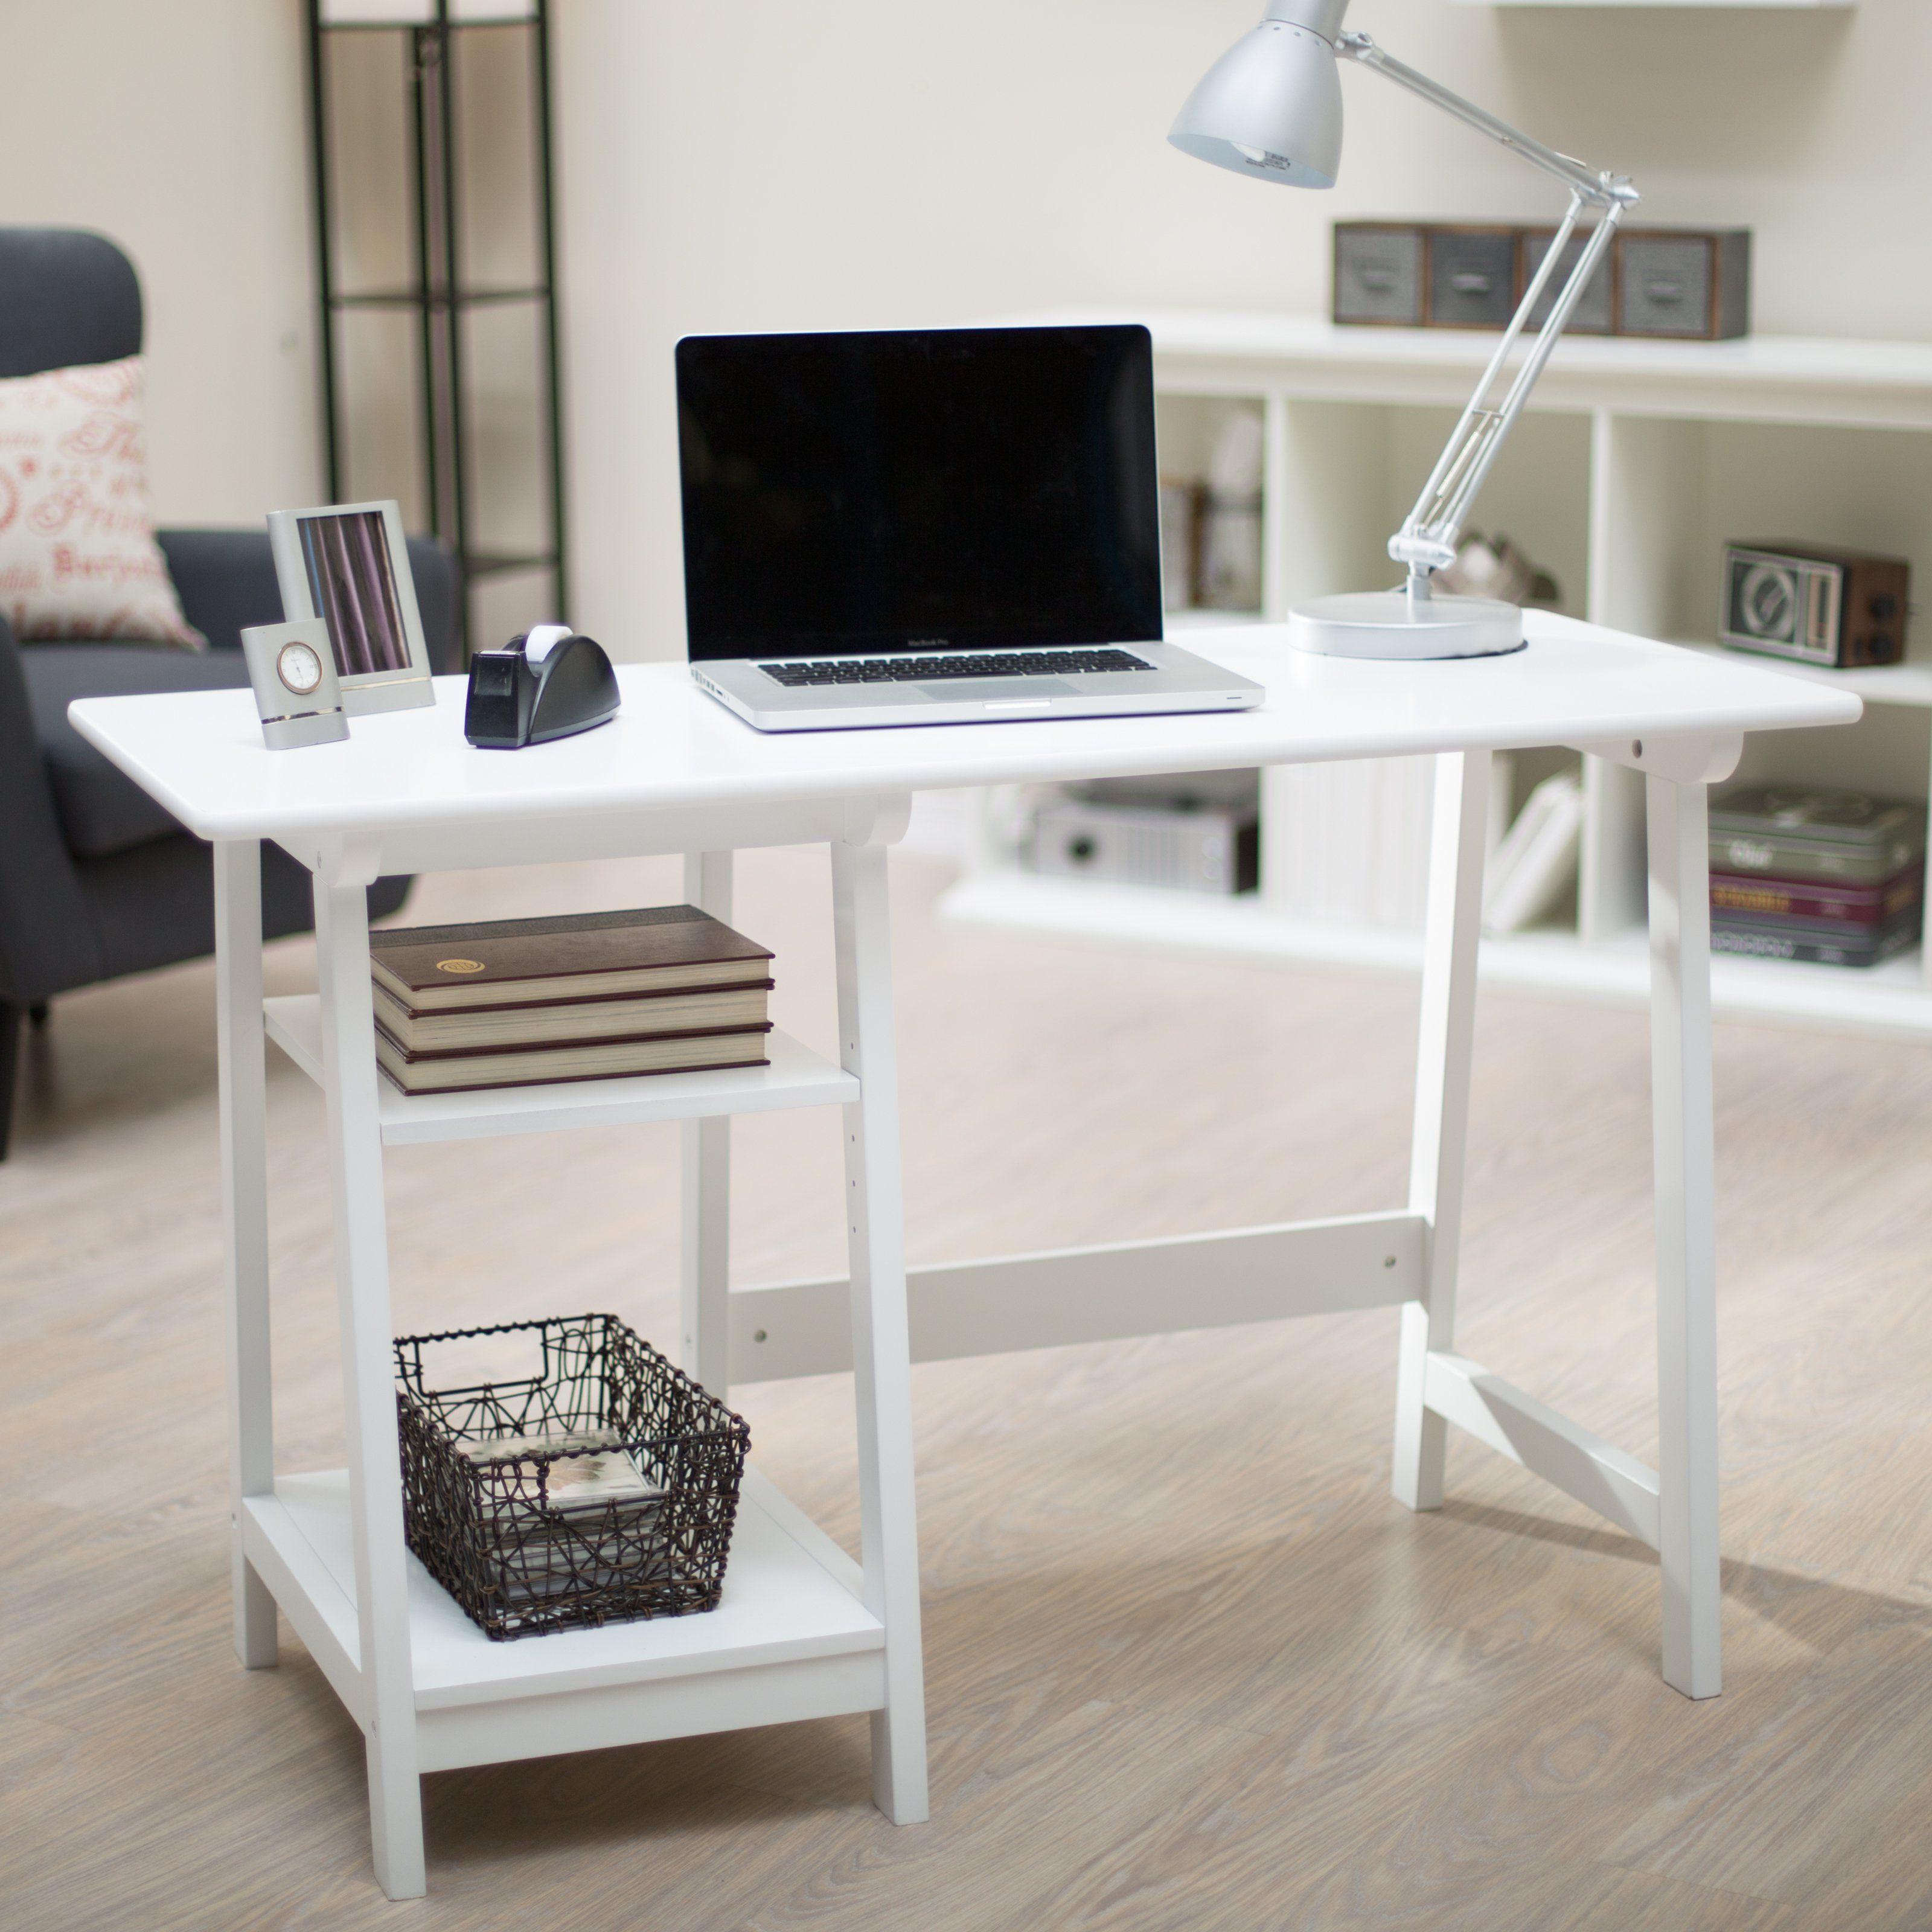 Manhattan open computer desk with adjustable shelf the manhattan